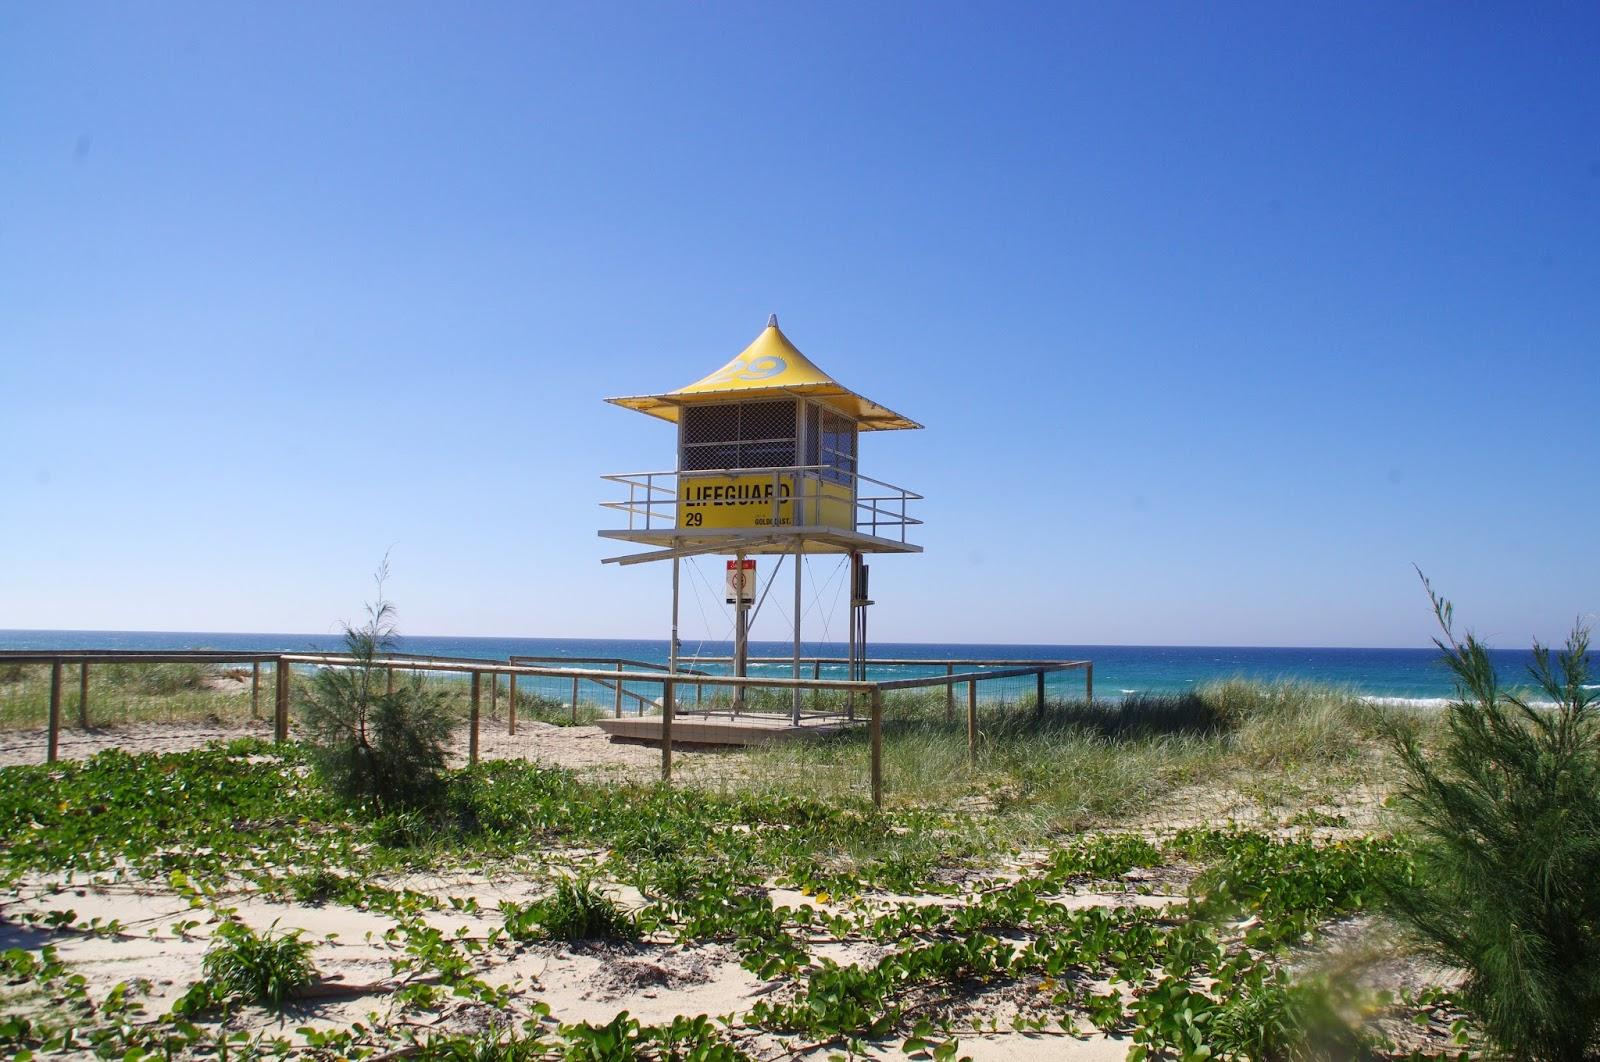 Gold Coast Beach Lifeguard Tower